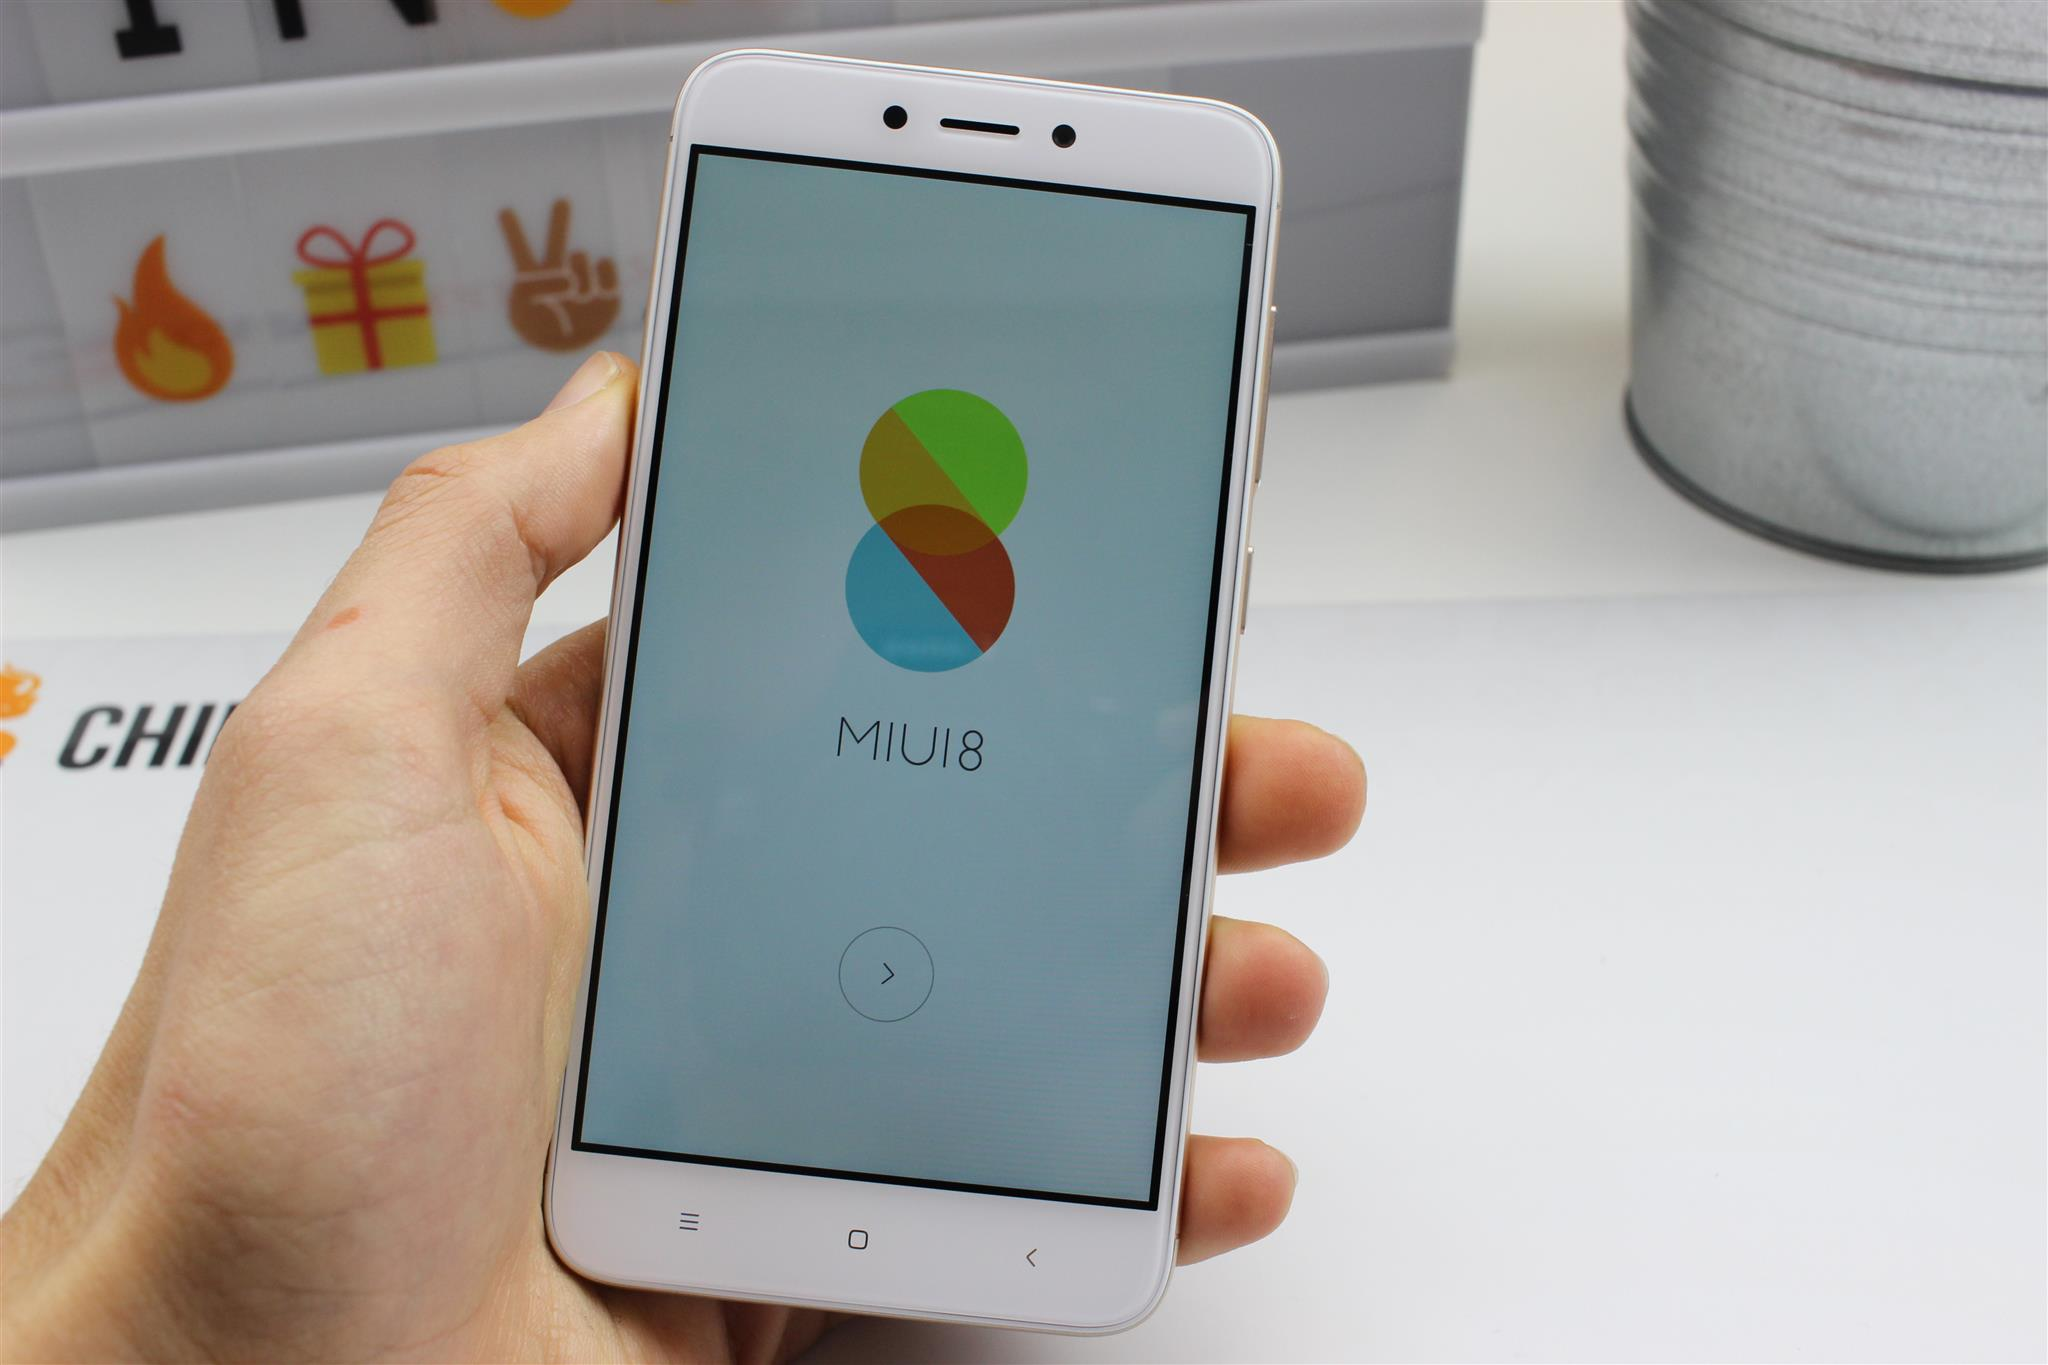 Xiaomi Redmi 4x Budget Smartphone Global Version Mit Lte Band 20 3x Ram 2 32gb